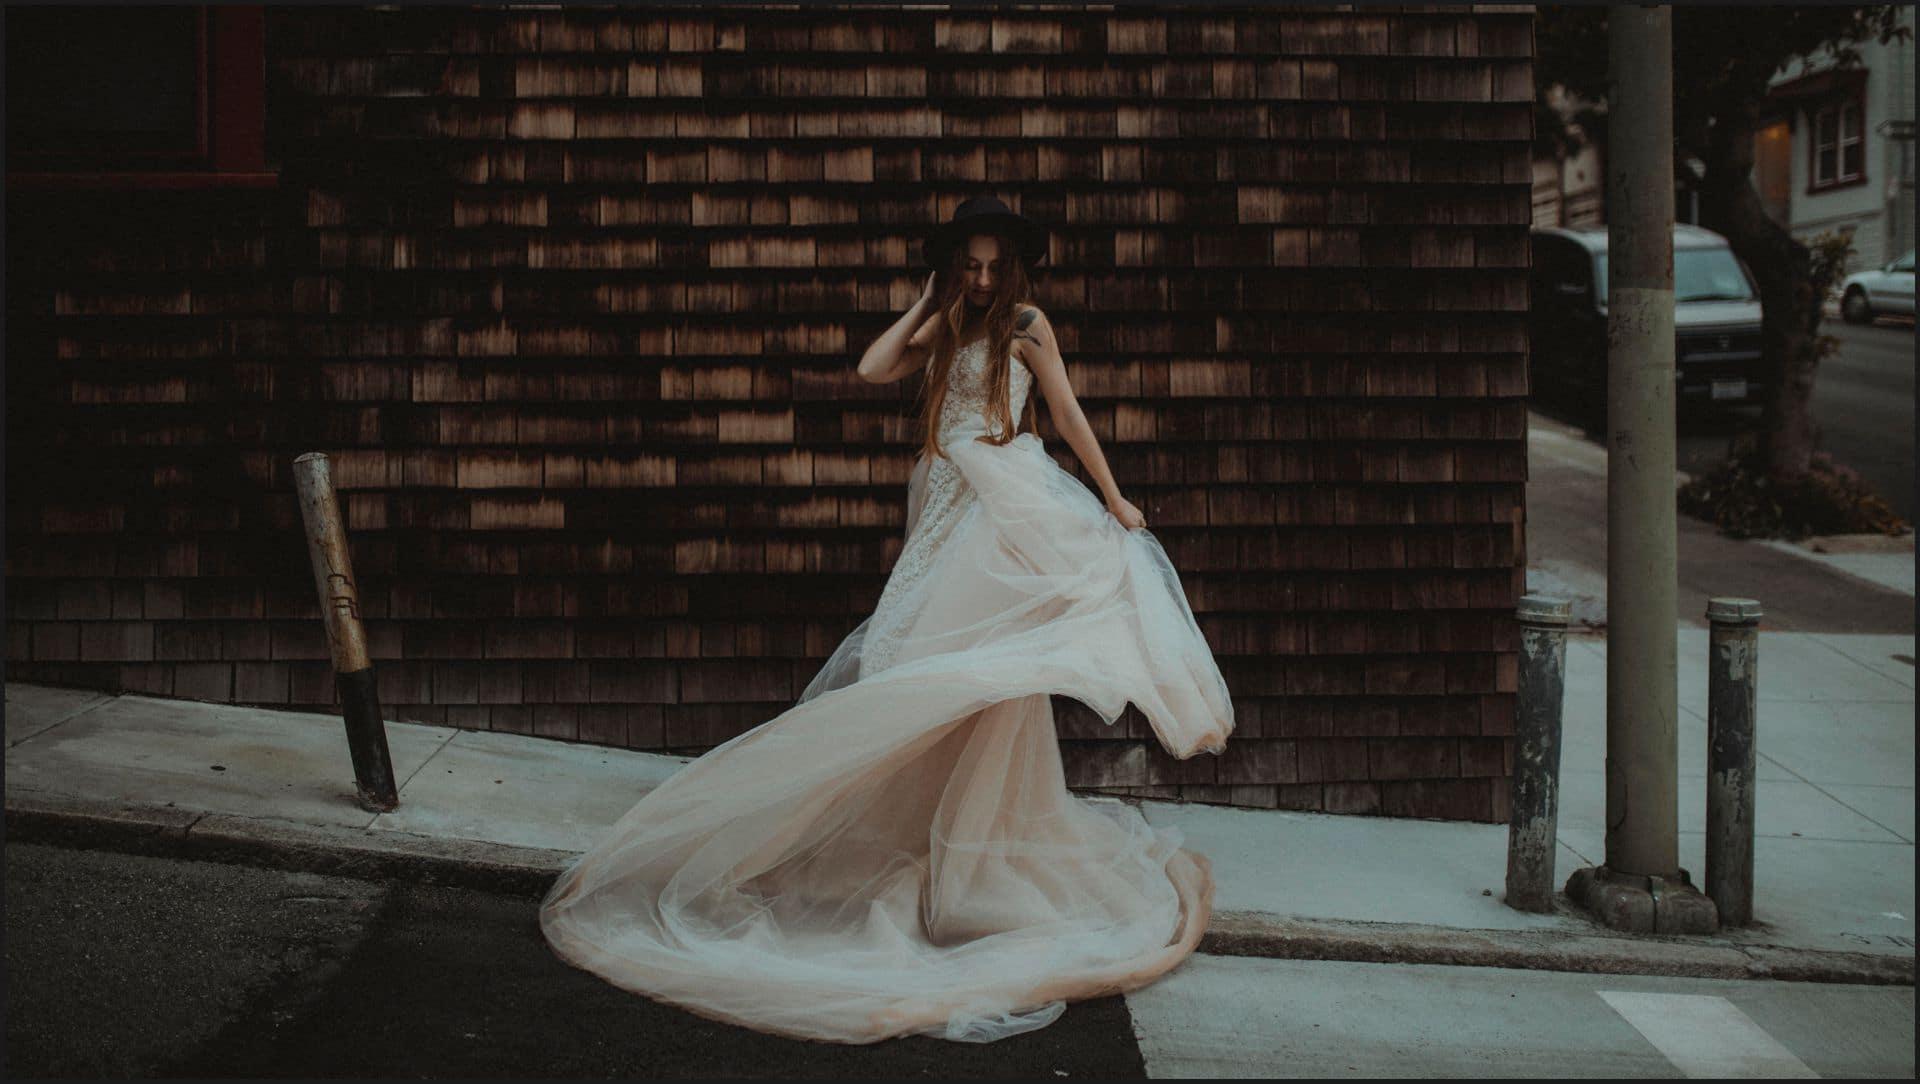 san francisco, california, elopement wedding, dress, bride